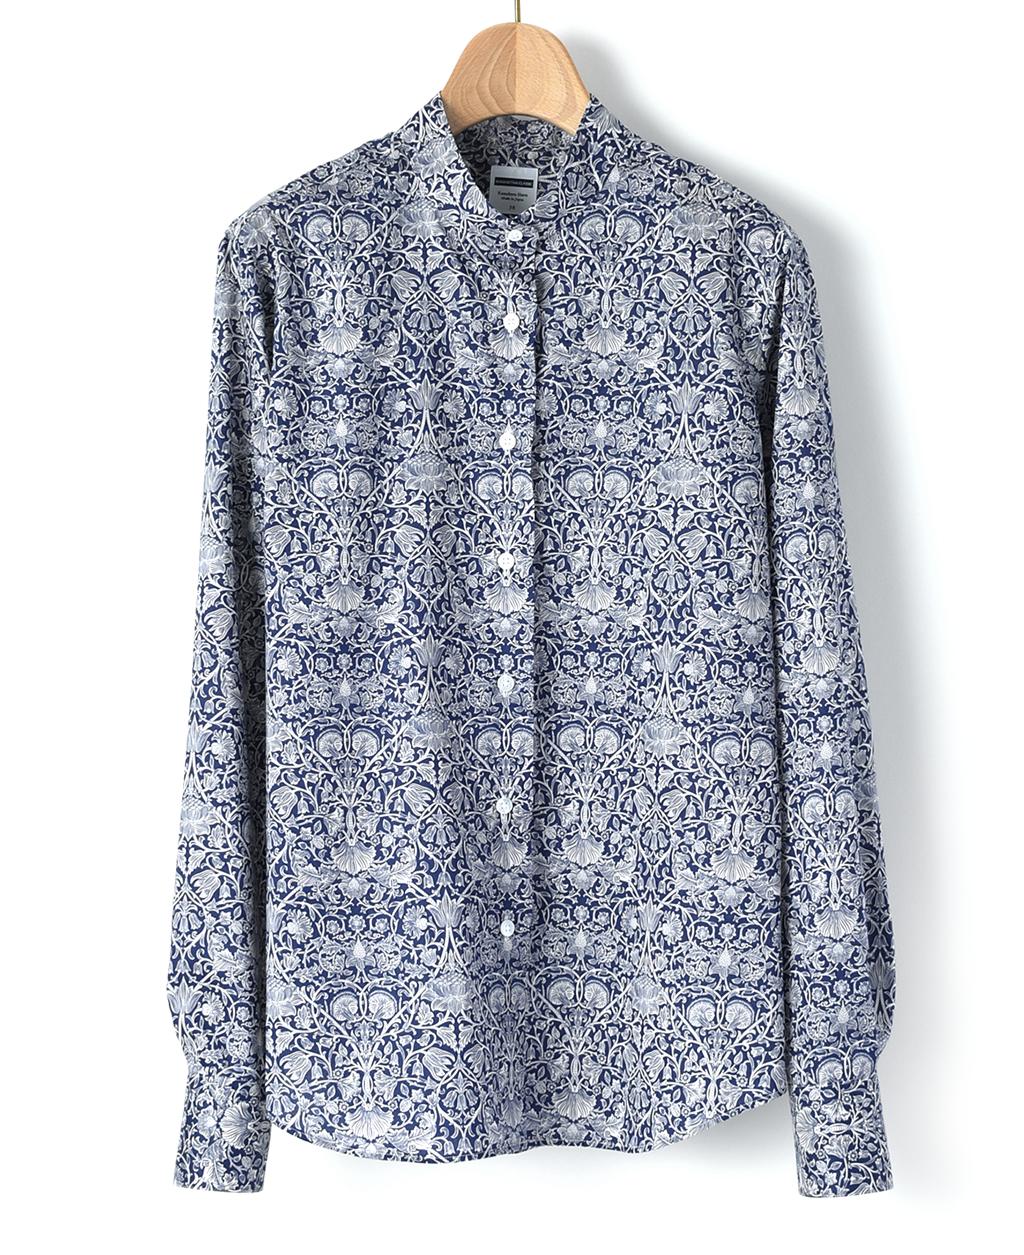 b86f79f290db42 マンハッタンクラシックシャツ(36サイズ / 7号 ブルー系): レディース ...